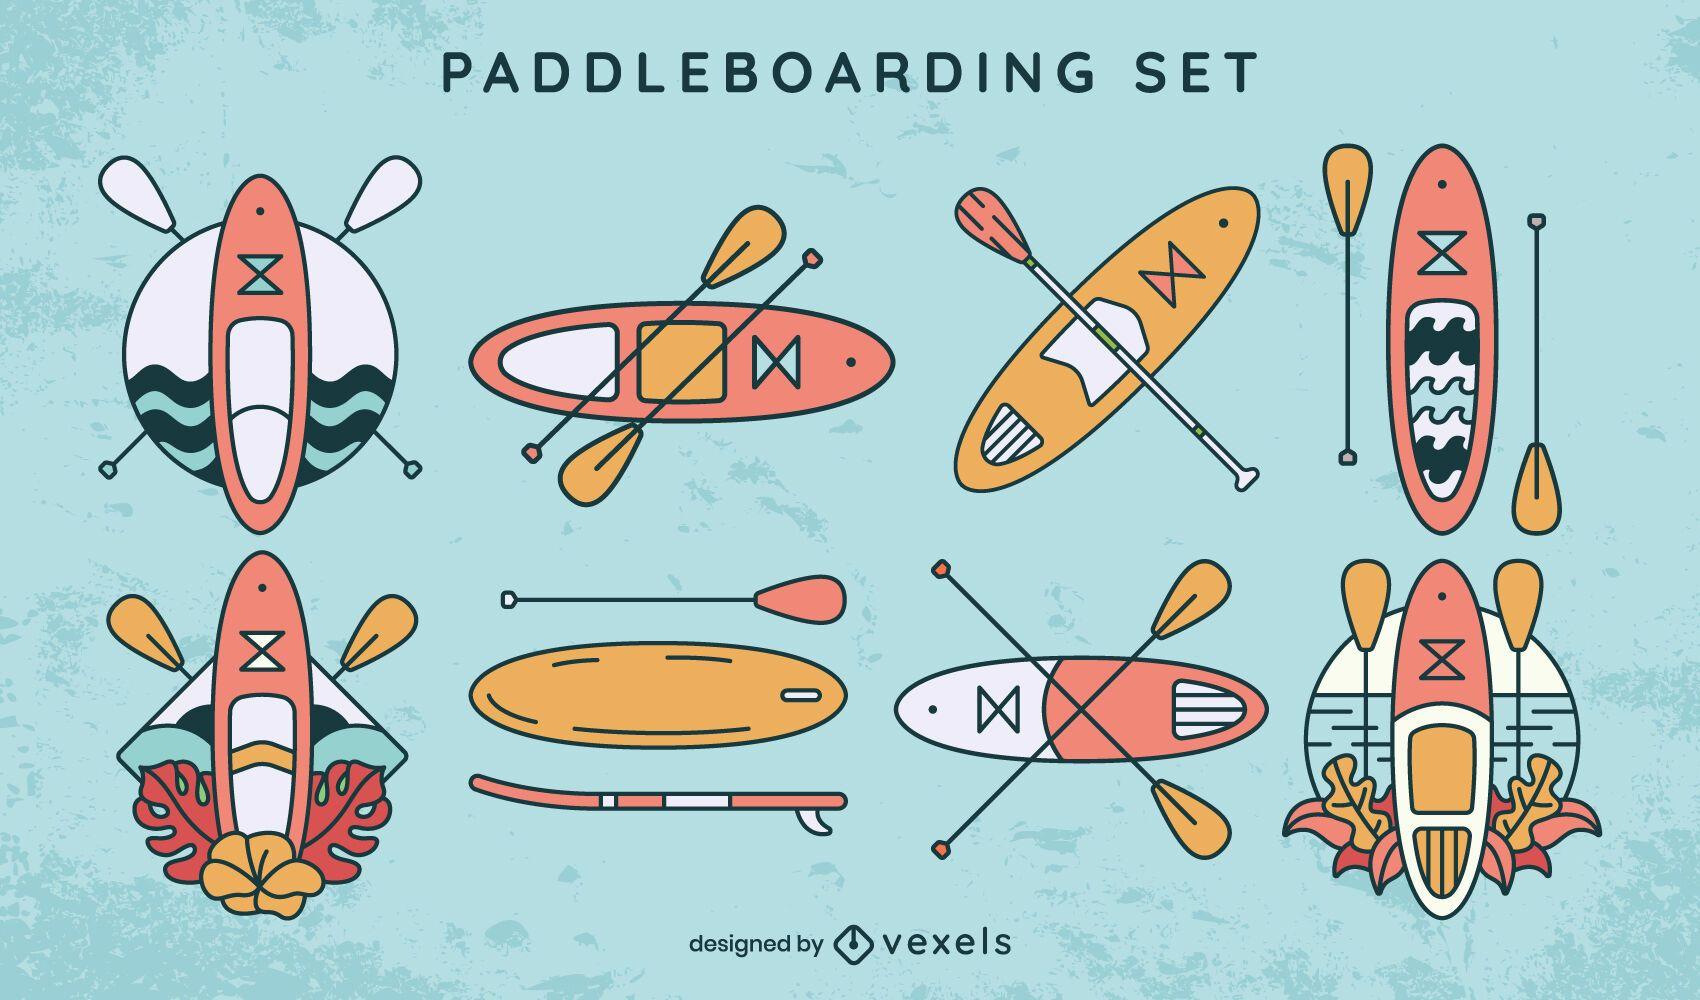 Paddleboarding equipment water sport set